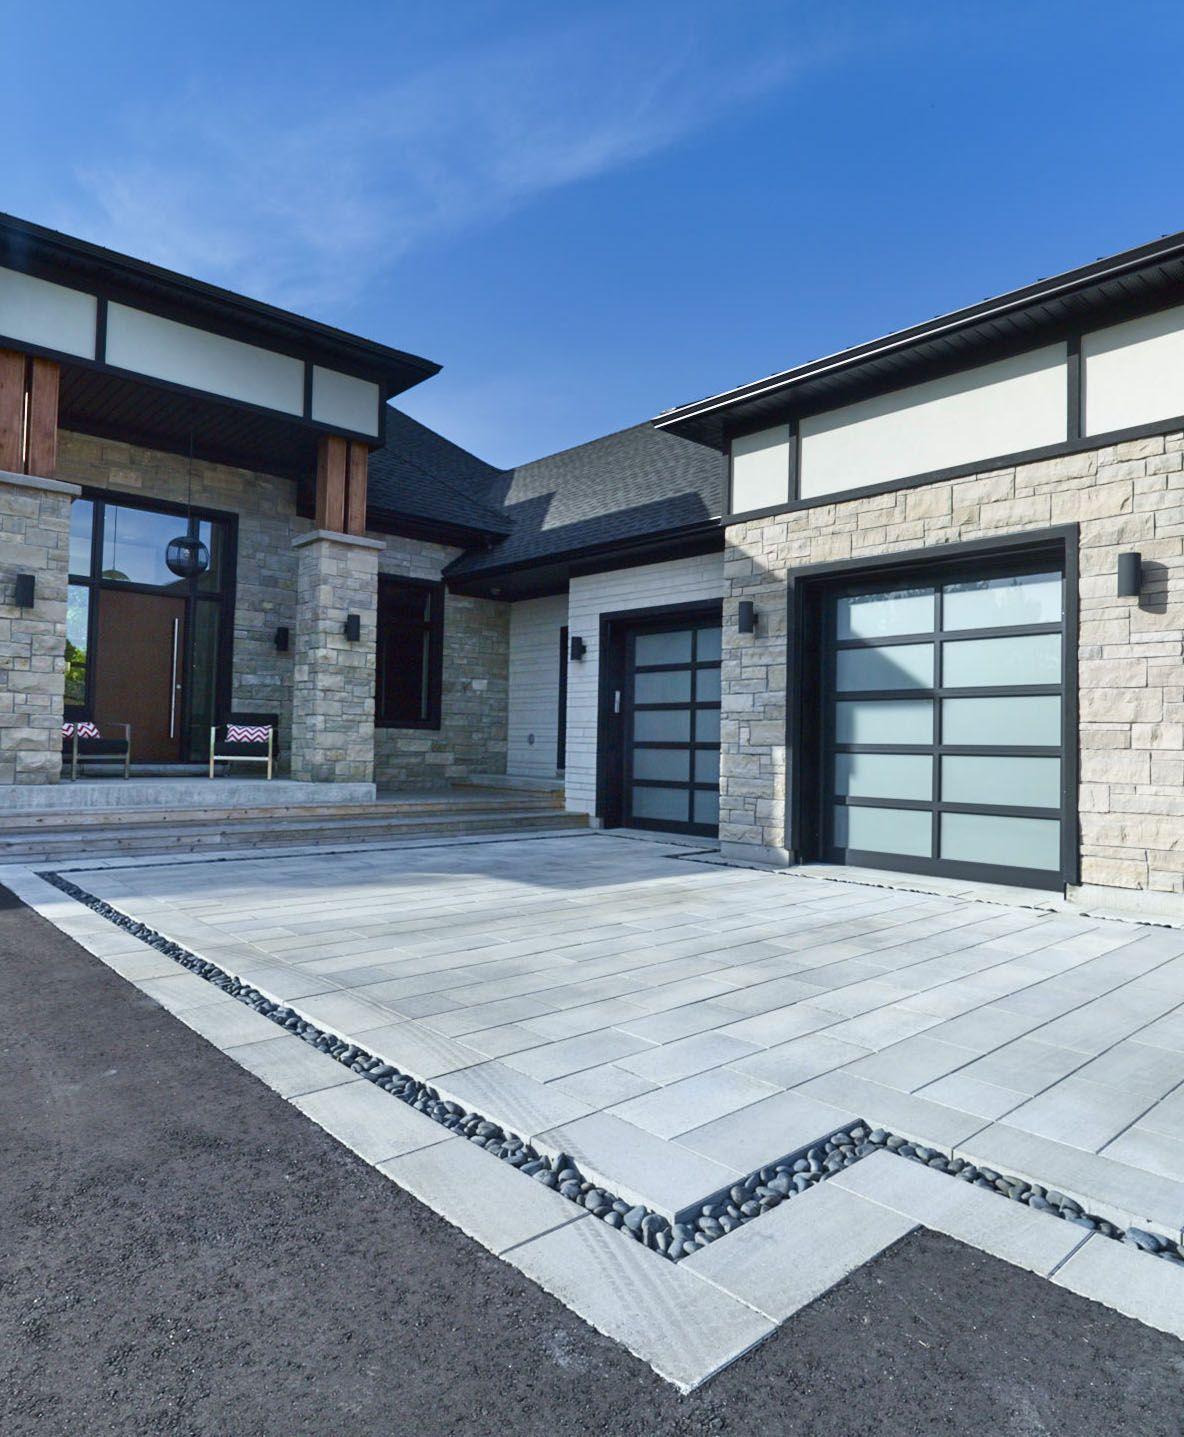 Home Driveway Design Ideas: Modern Contemporary Driveway Inspiration